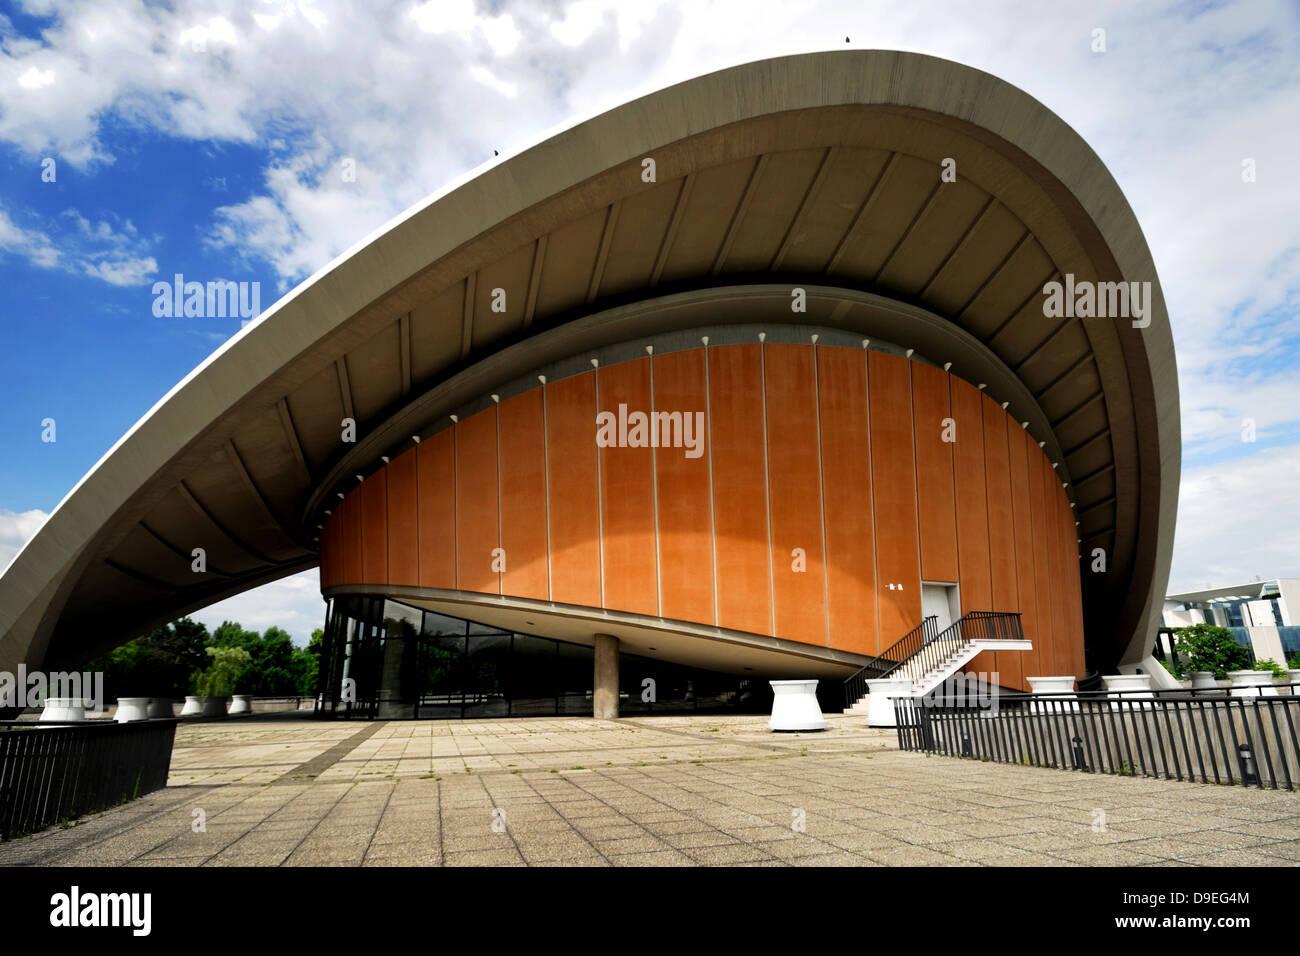 Stock photo berlin haus der kulturen welt welt house of world cultures designed in 1957 by american architect hugh stubbins jr